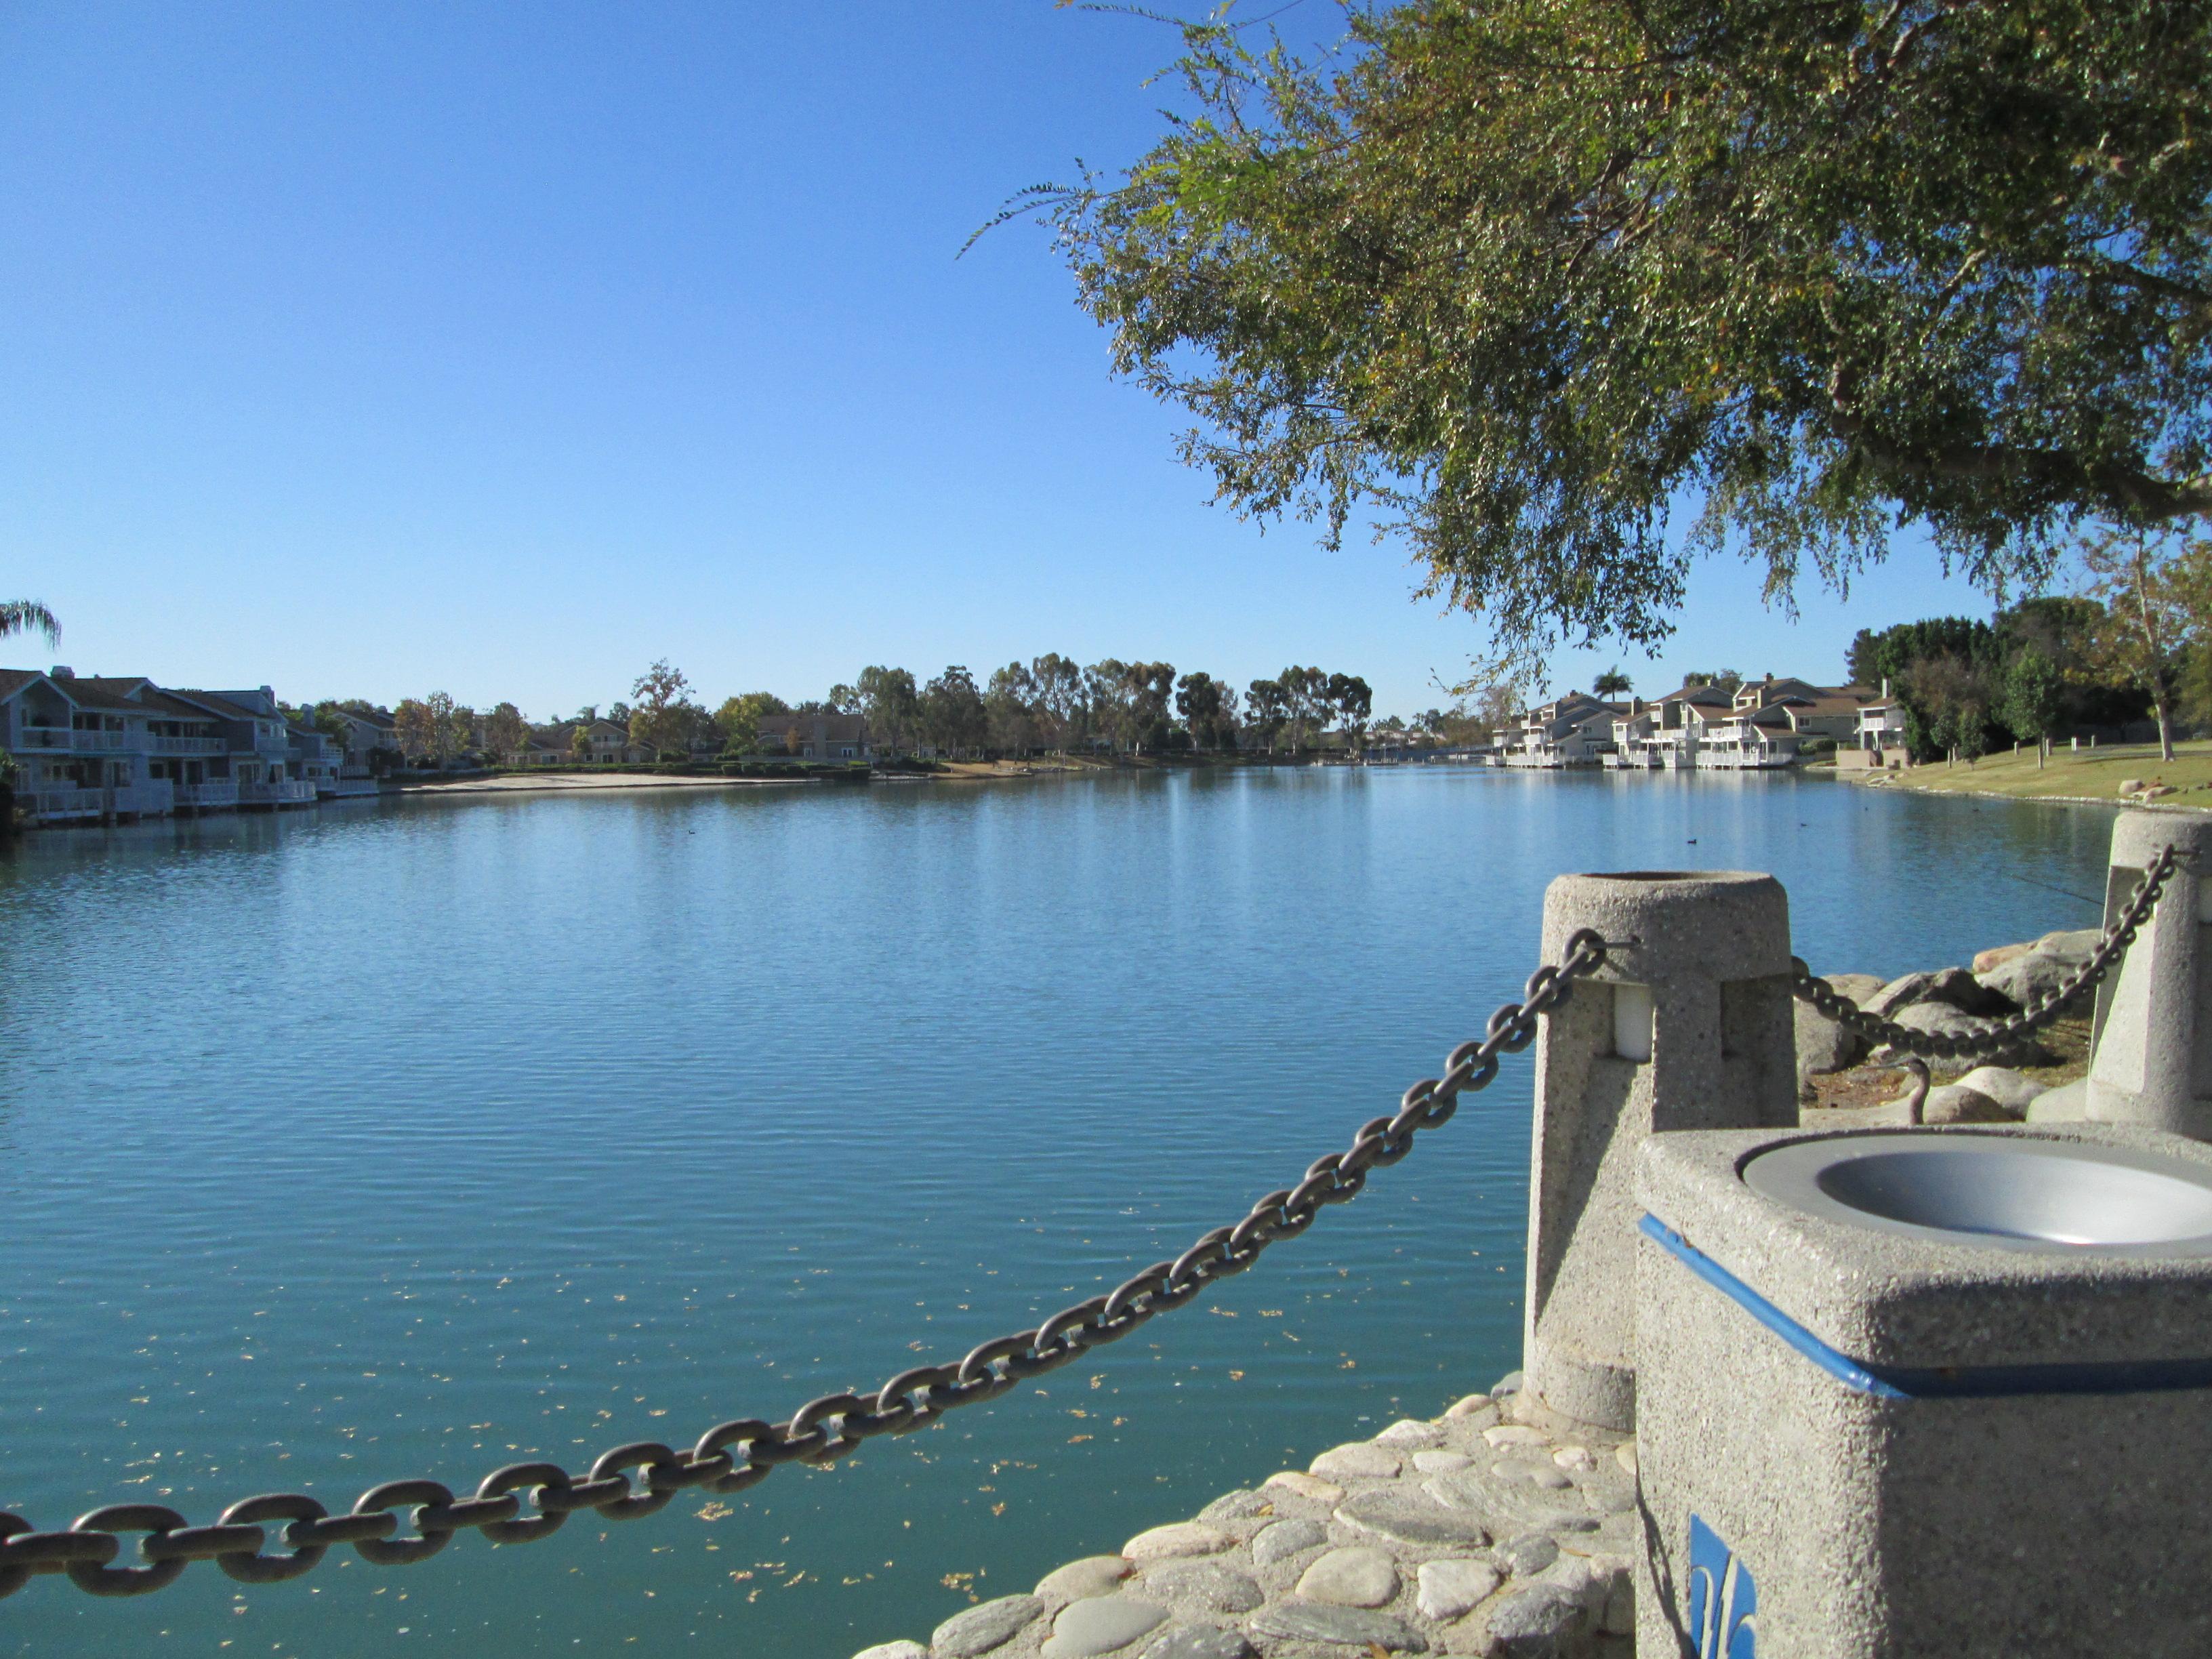 Irvine Lakes